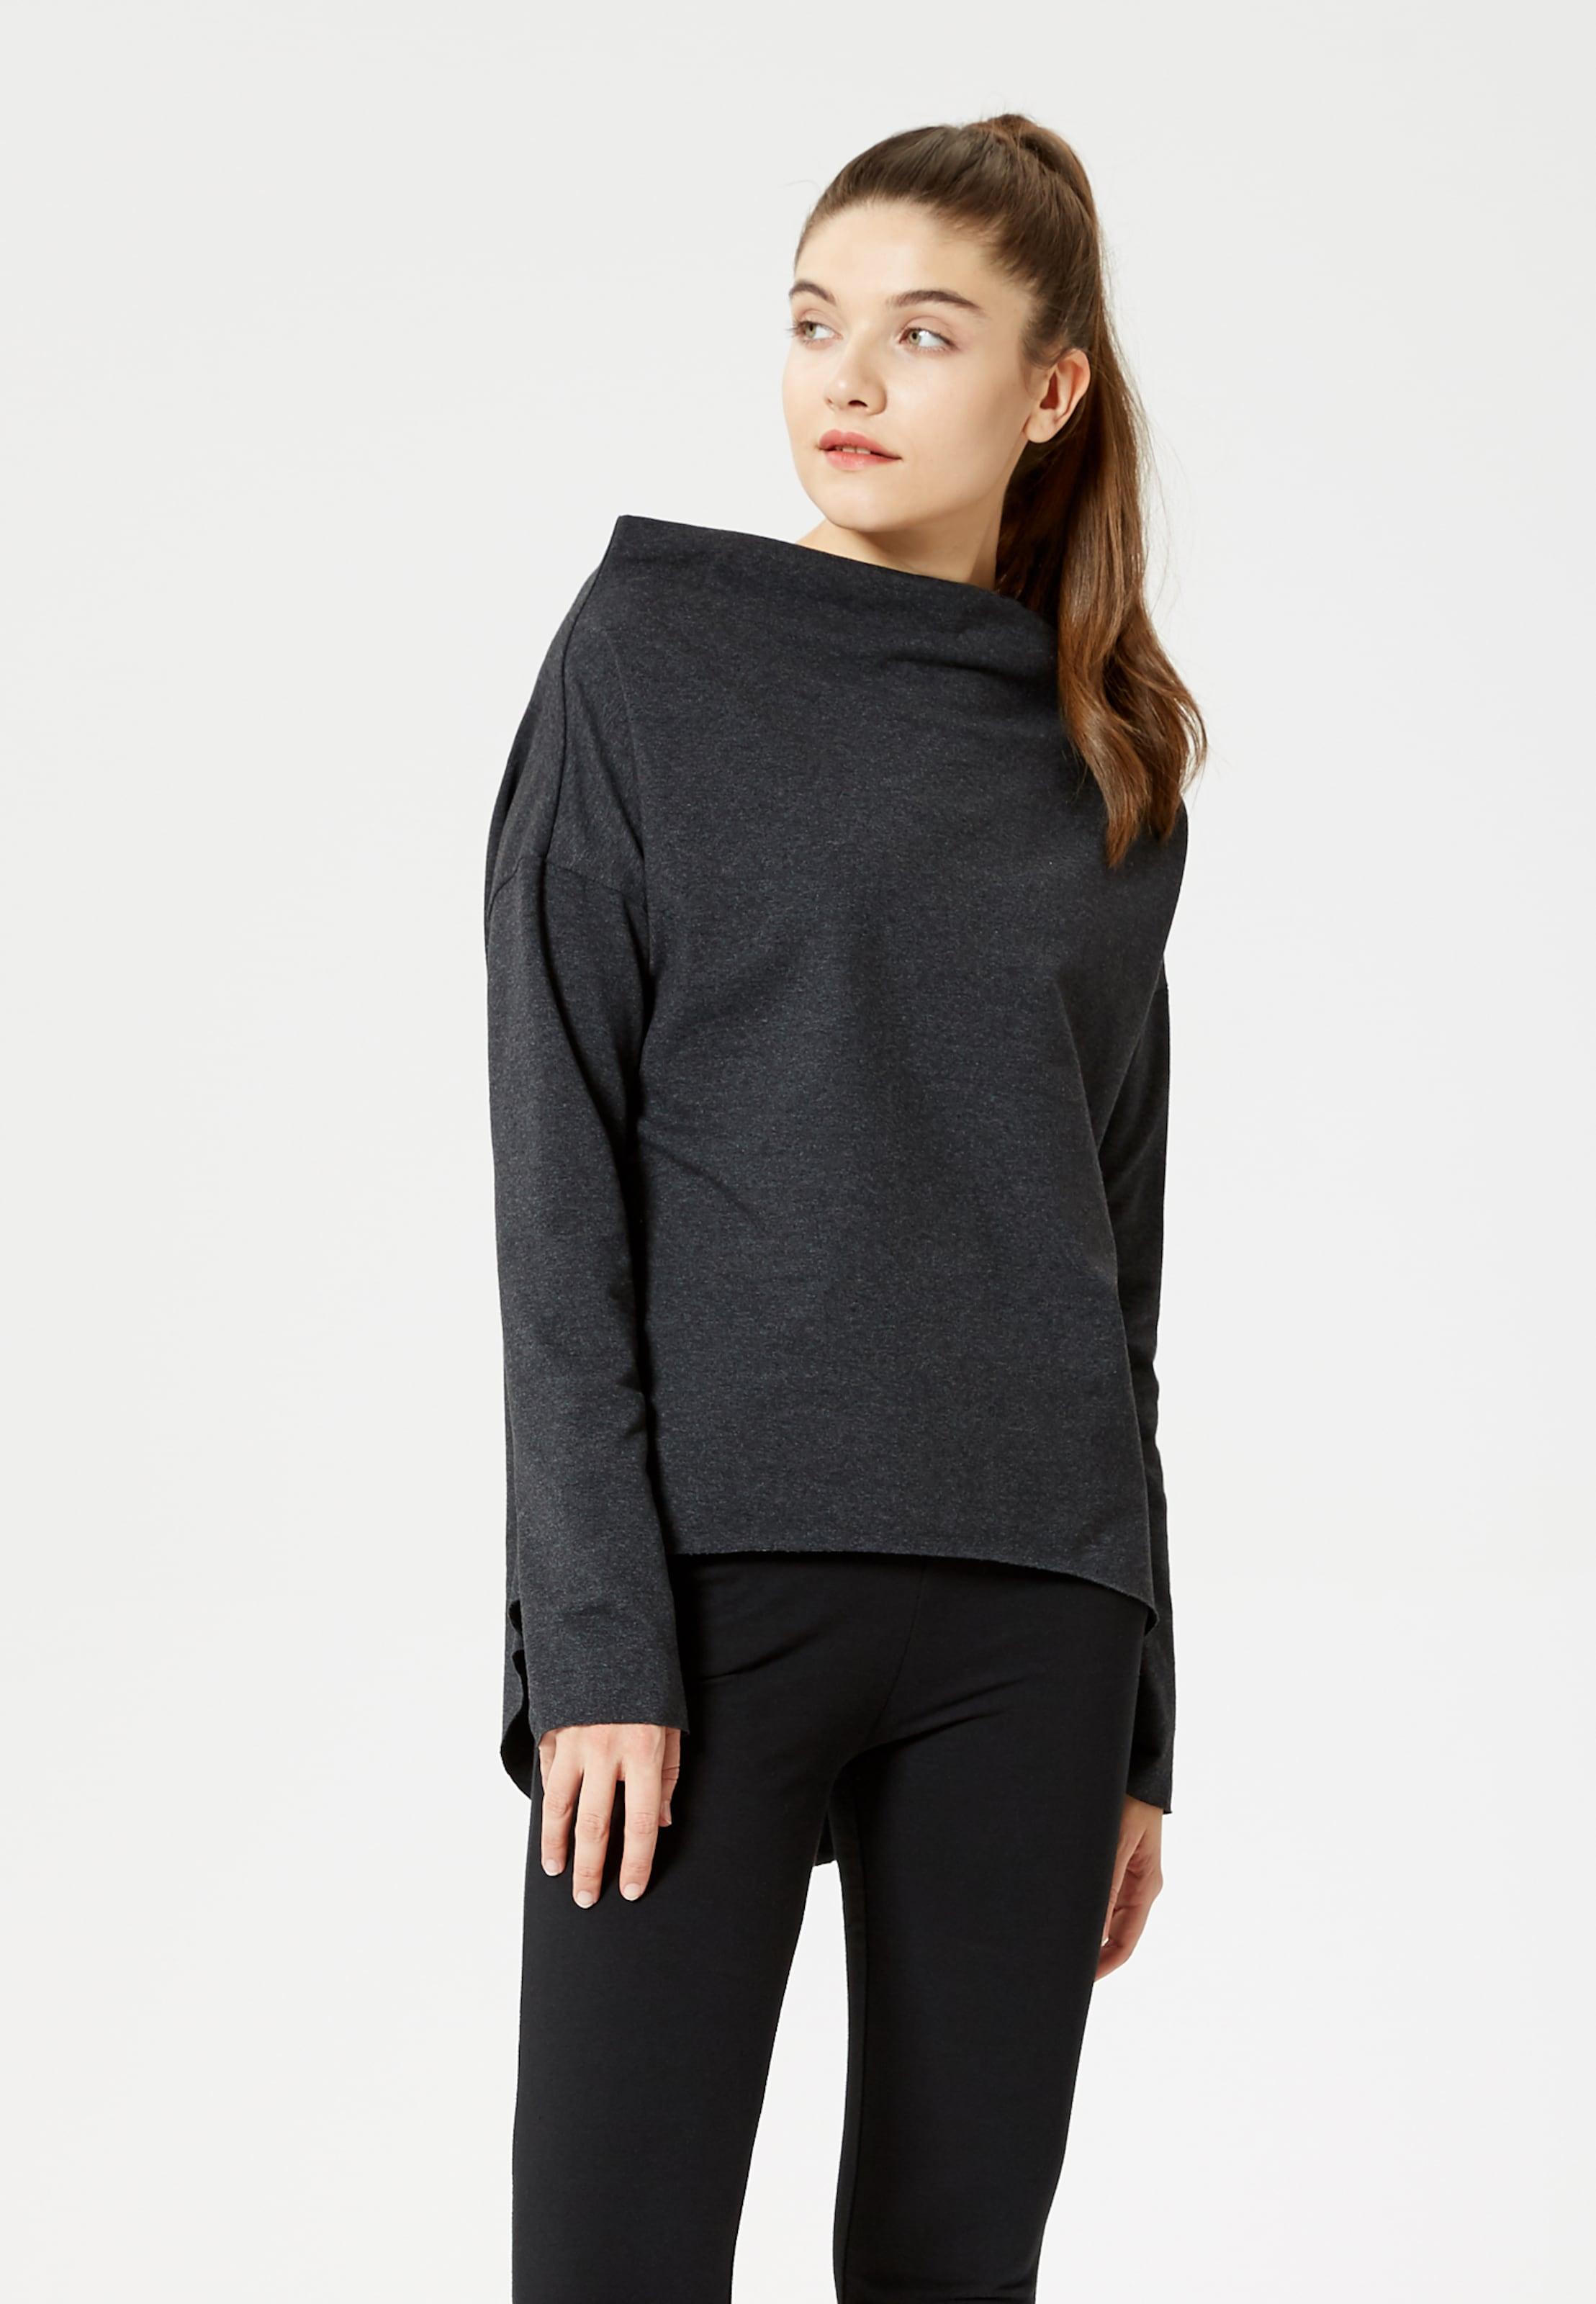 In Graphit In Talence Talence In Graphit Talence Shirt Talence Shirt In Graphit Shirt Shirt trxBCdhQs